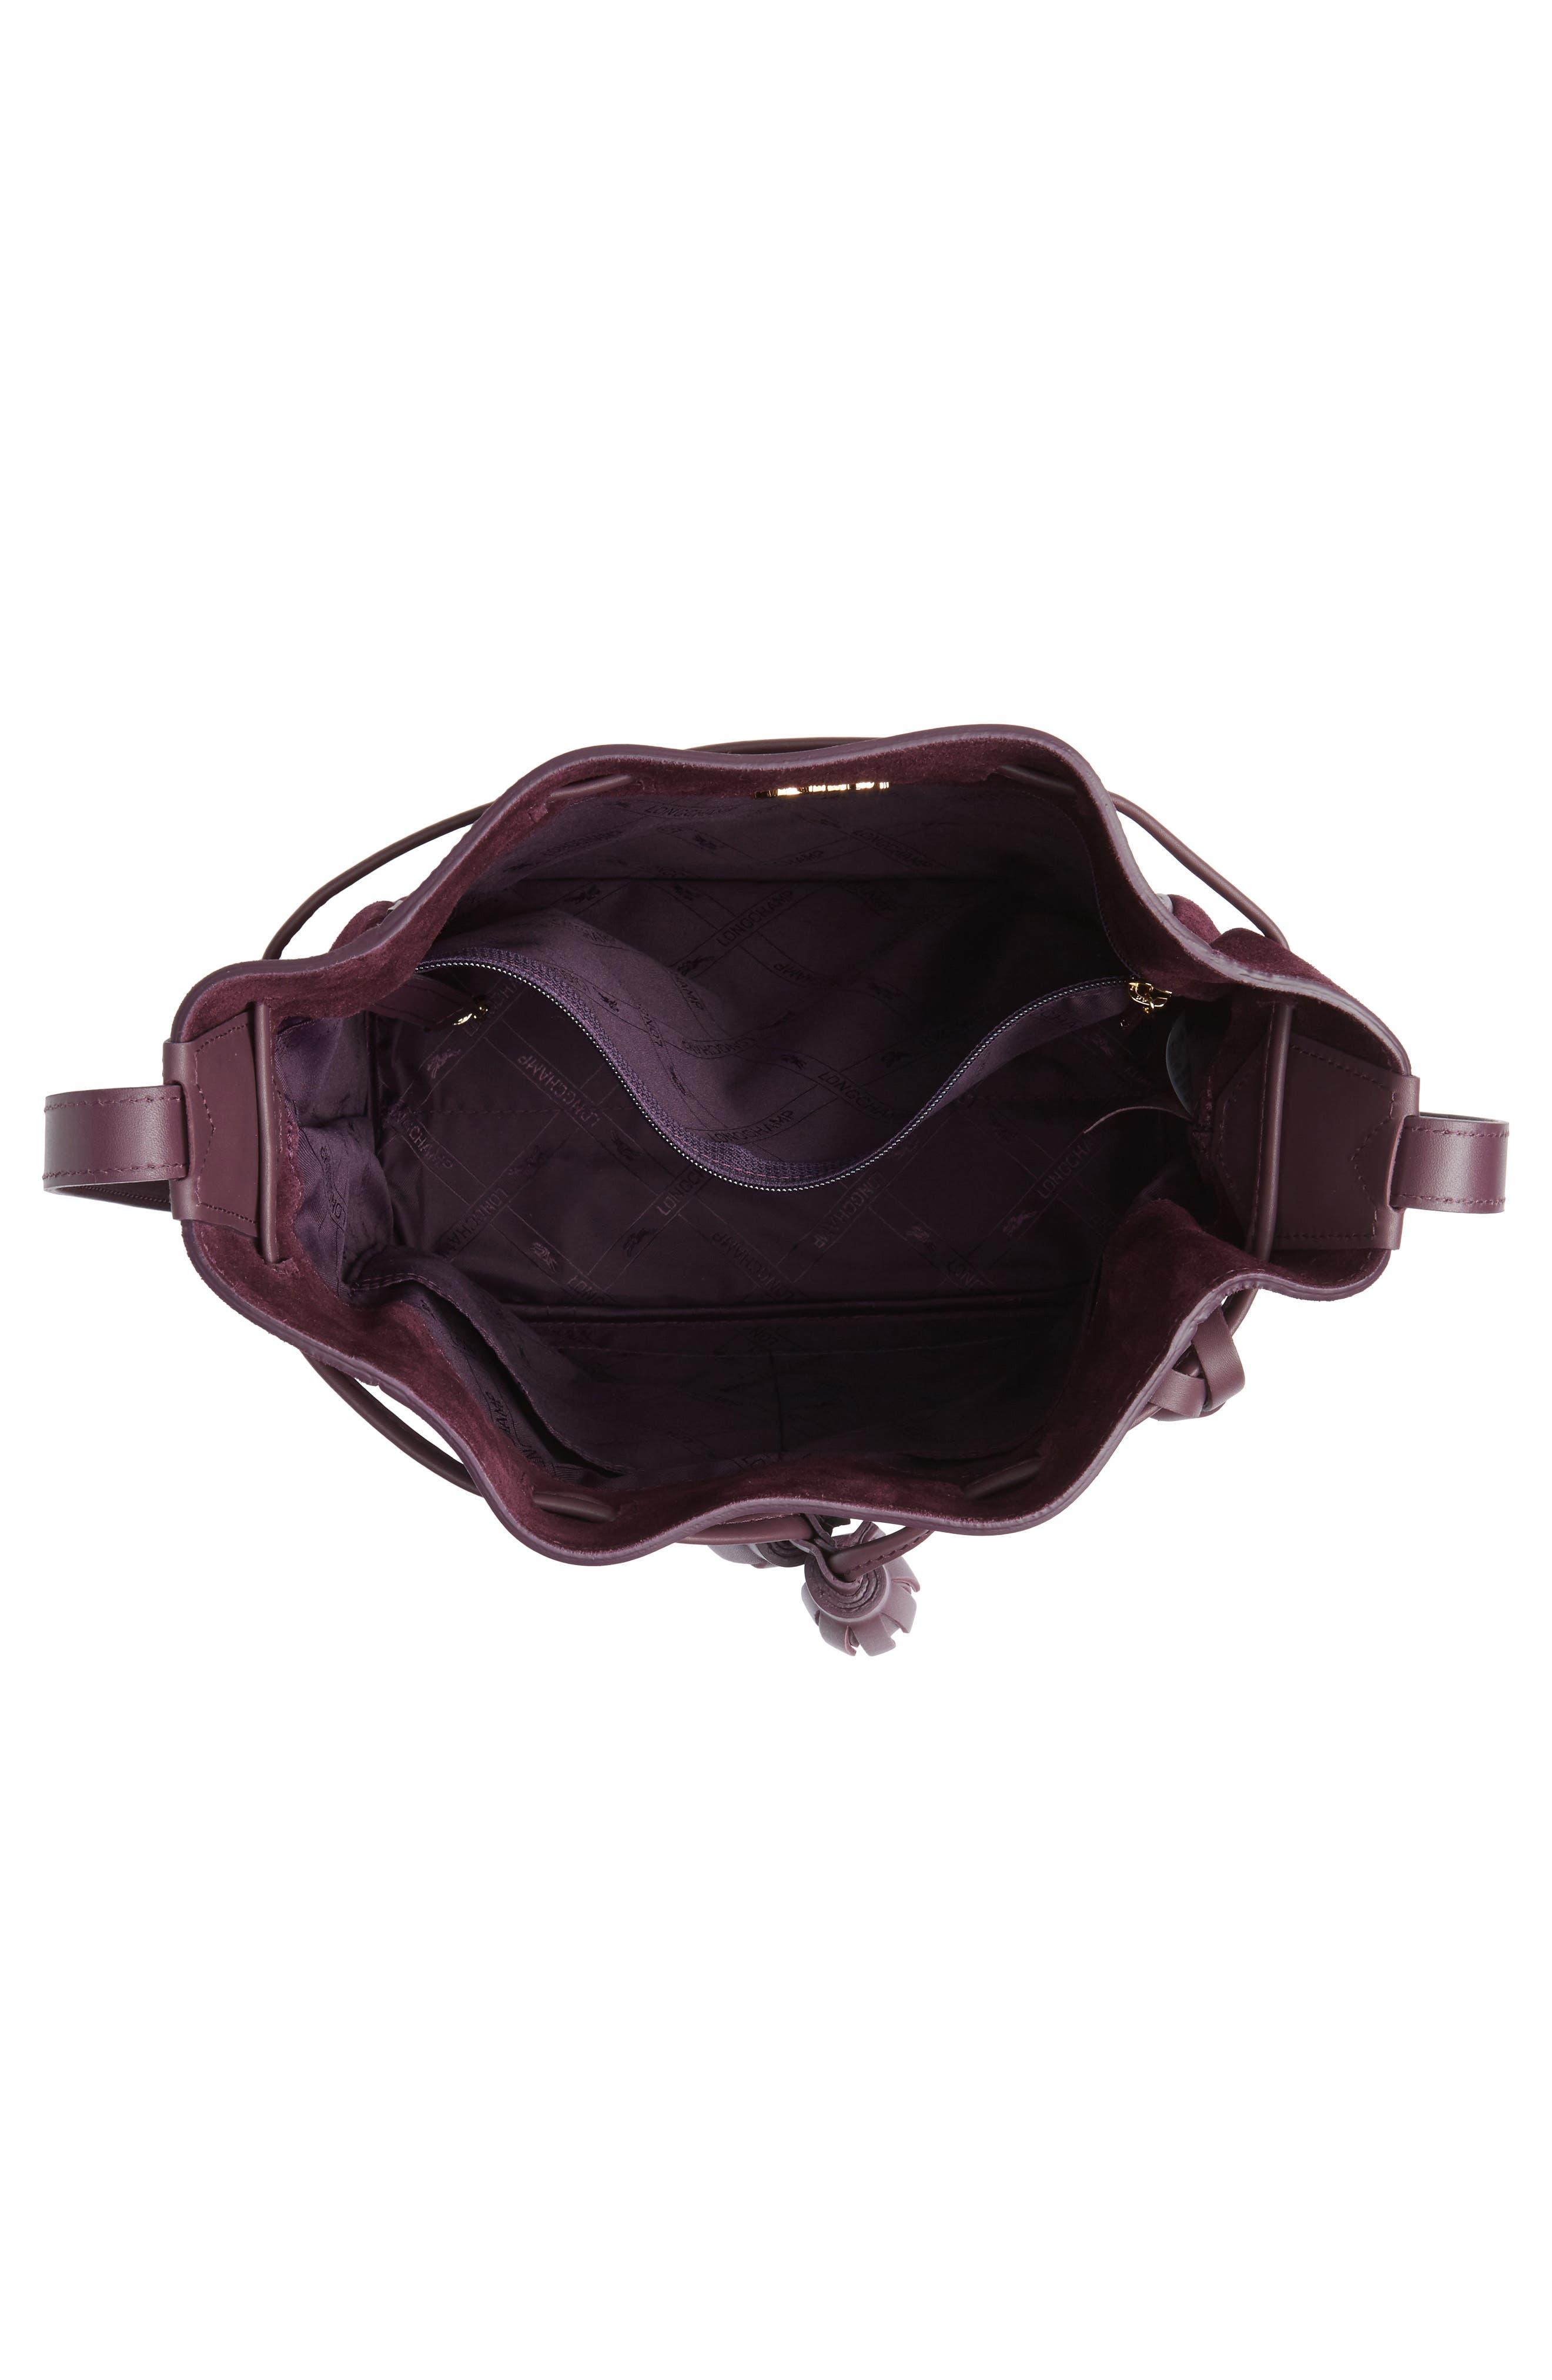 Penelope Fantasie Leather Bucket Bag,                             Alternate thumbnail 10, color,